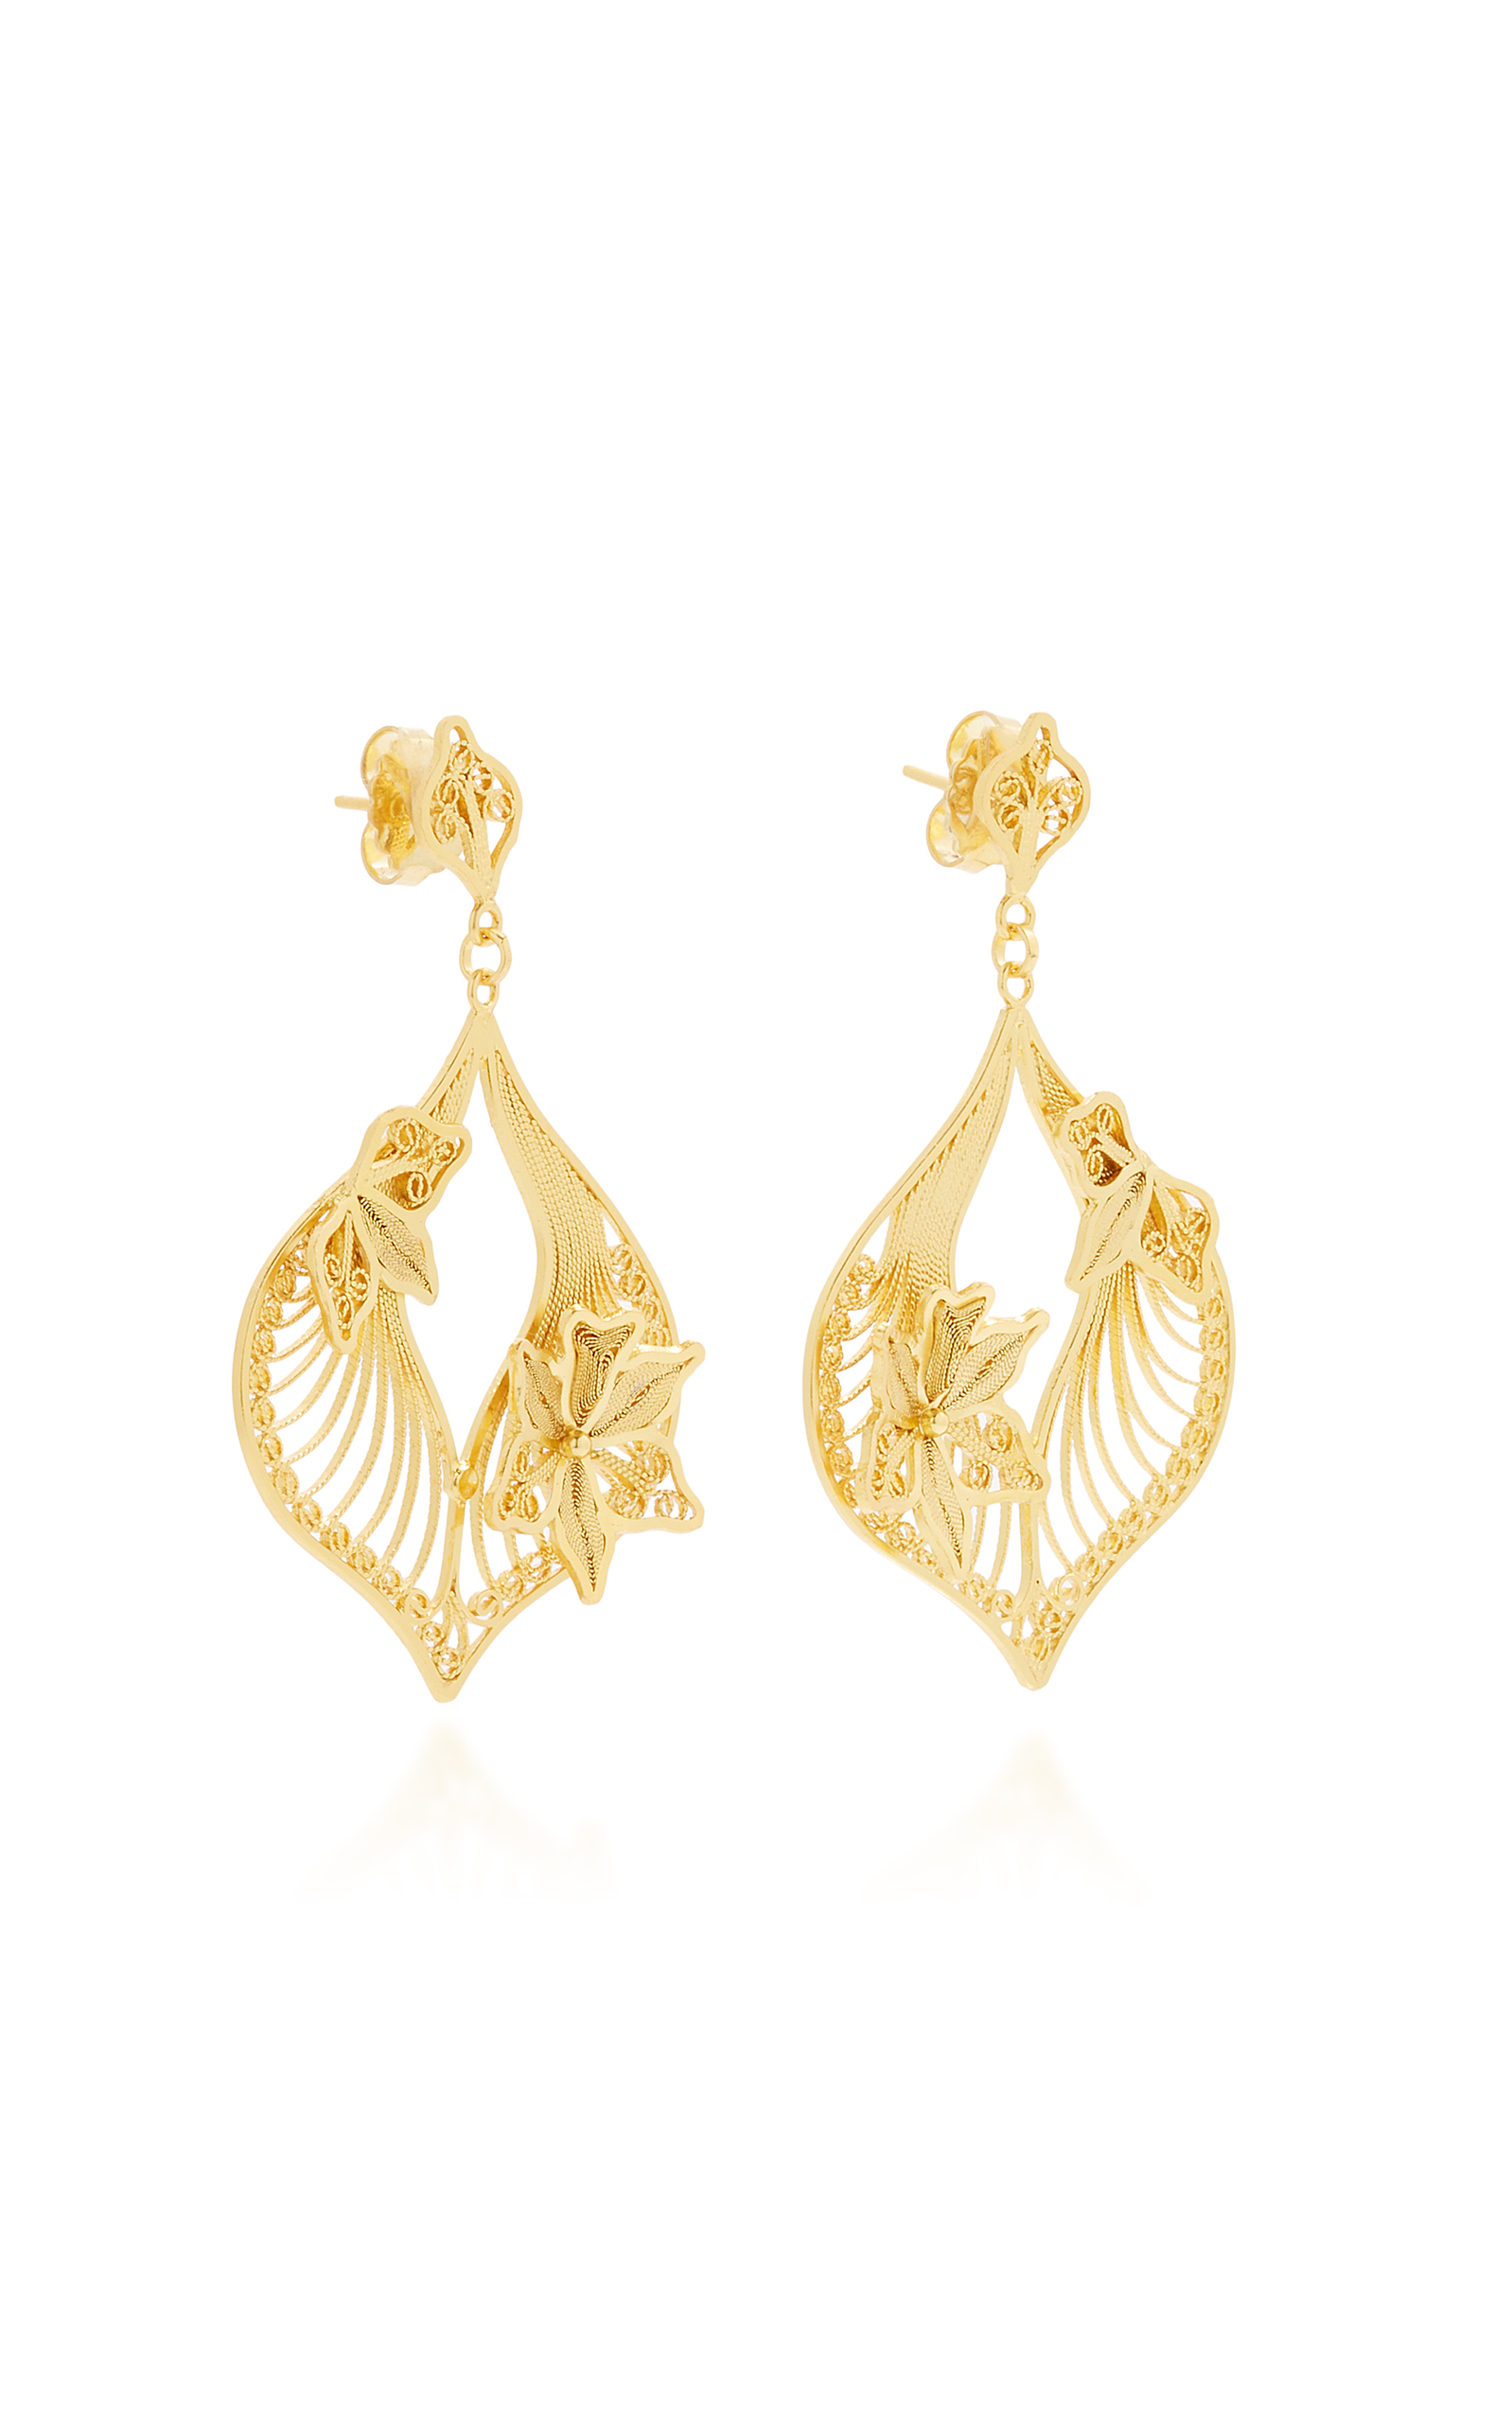 Moda operandi clara chandelier earrings by mallarino loading arubaitofo Images